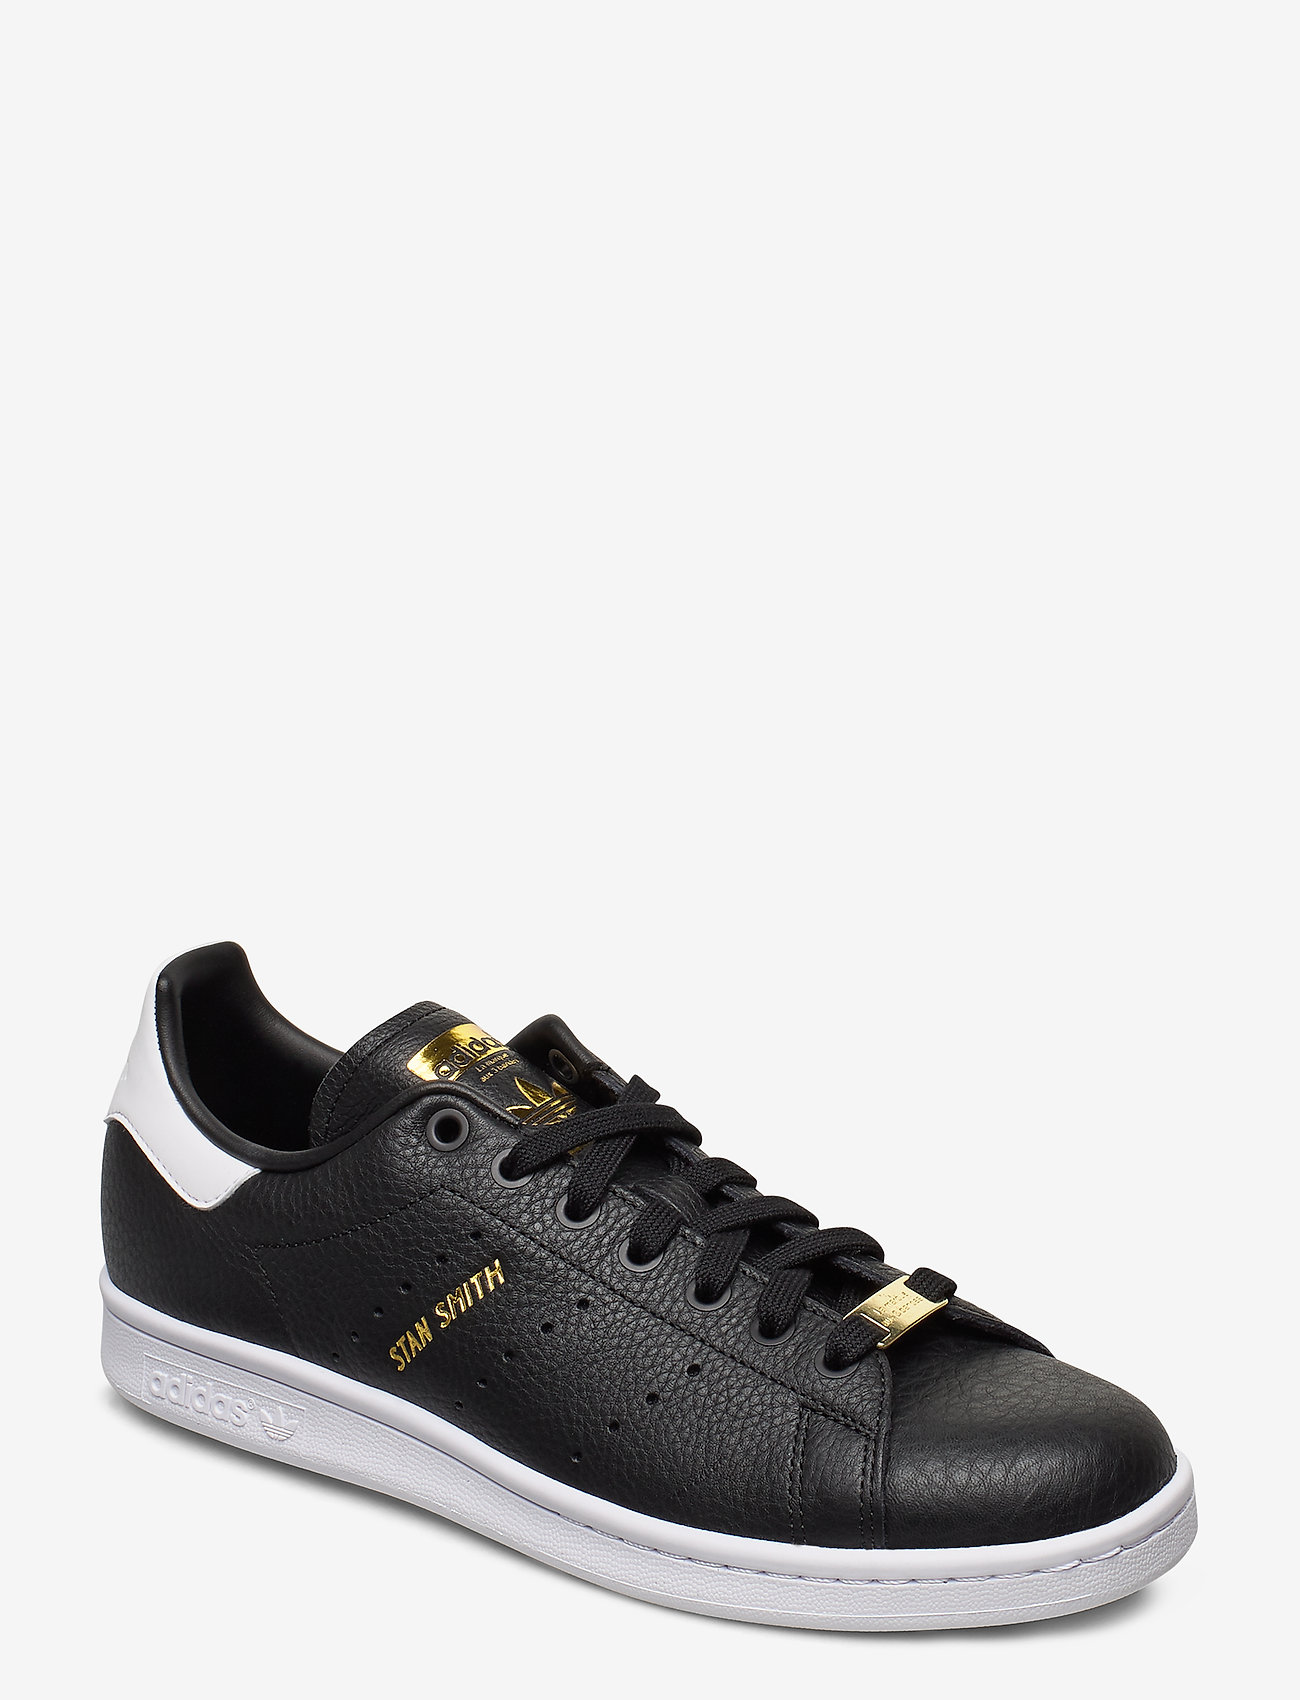 adidas Originals - STAN SMITH - lav ankel - cblack/cblack/ftwwht - 0